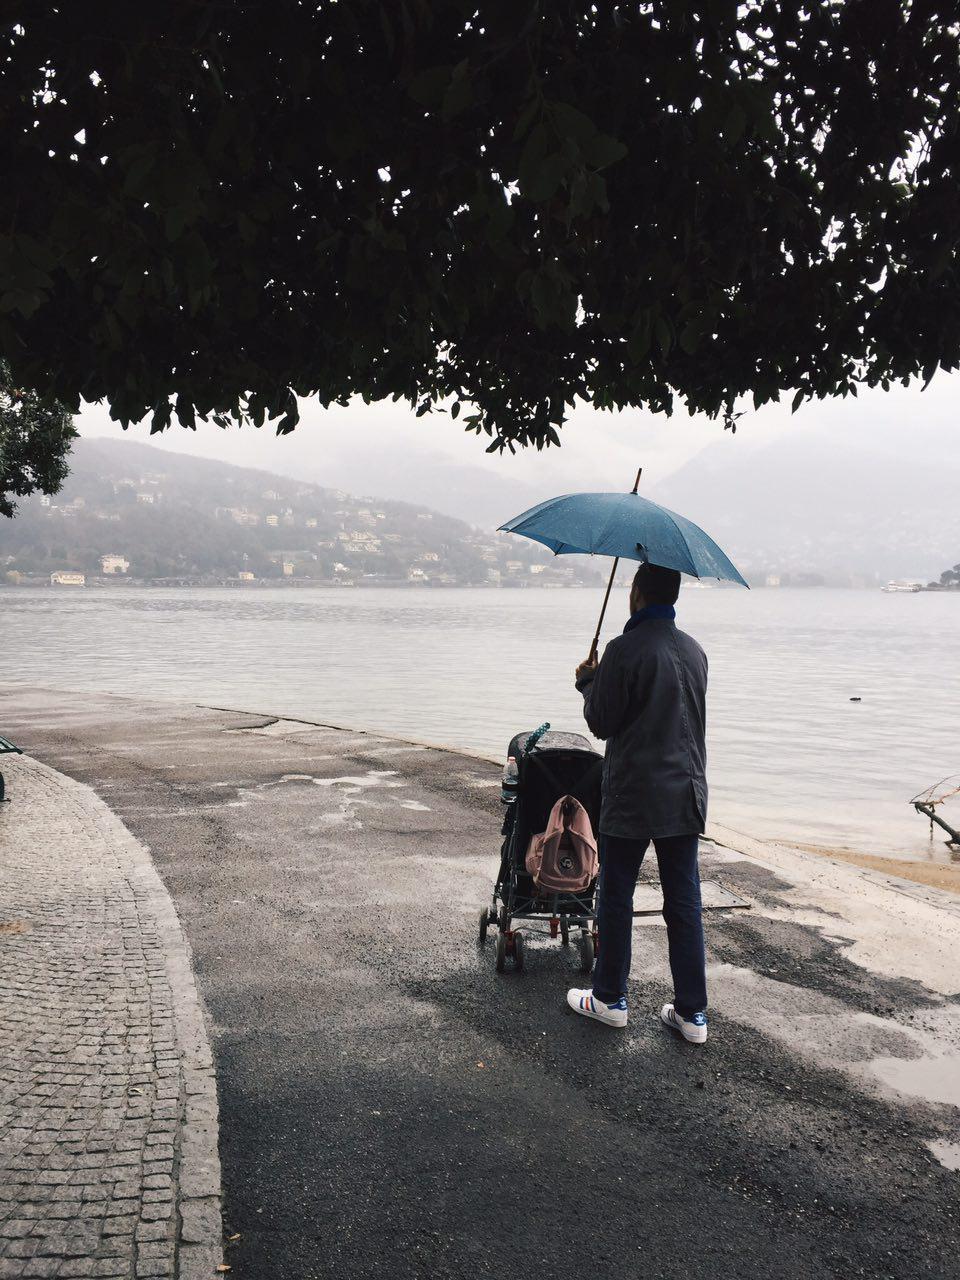 Непогода в Комо - Батин Блог